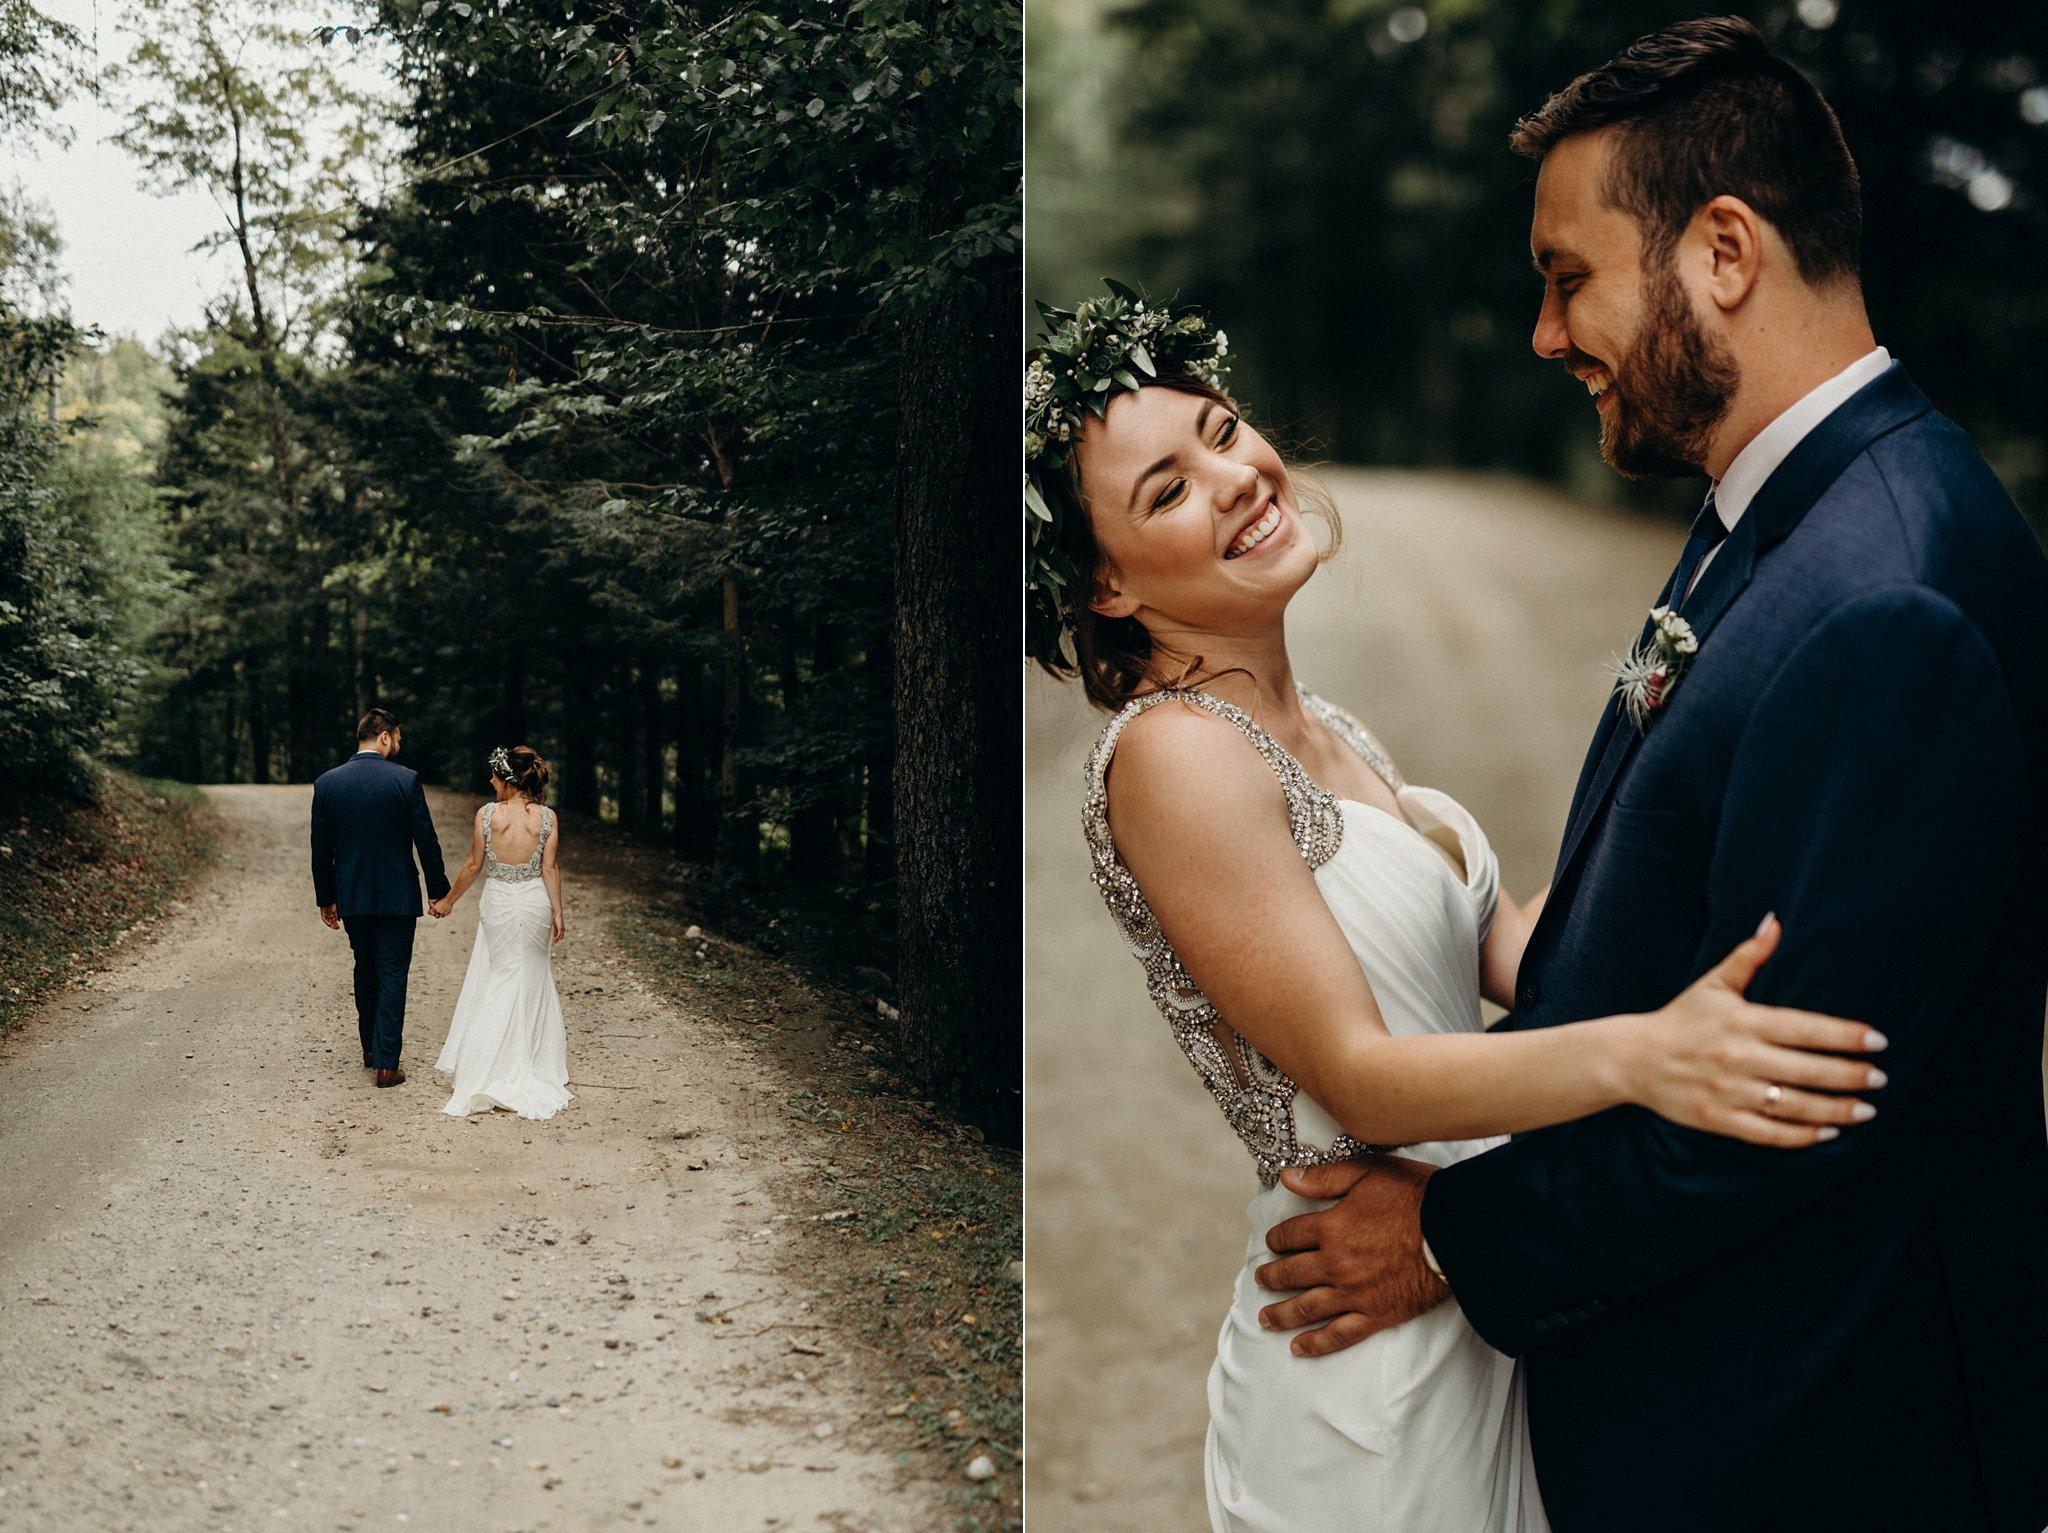 kaihla_tonai_intimate_wedding_elopement_photographer_6578.jpg